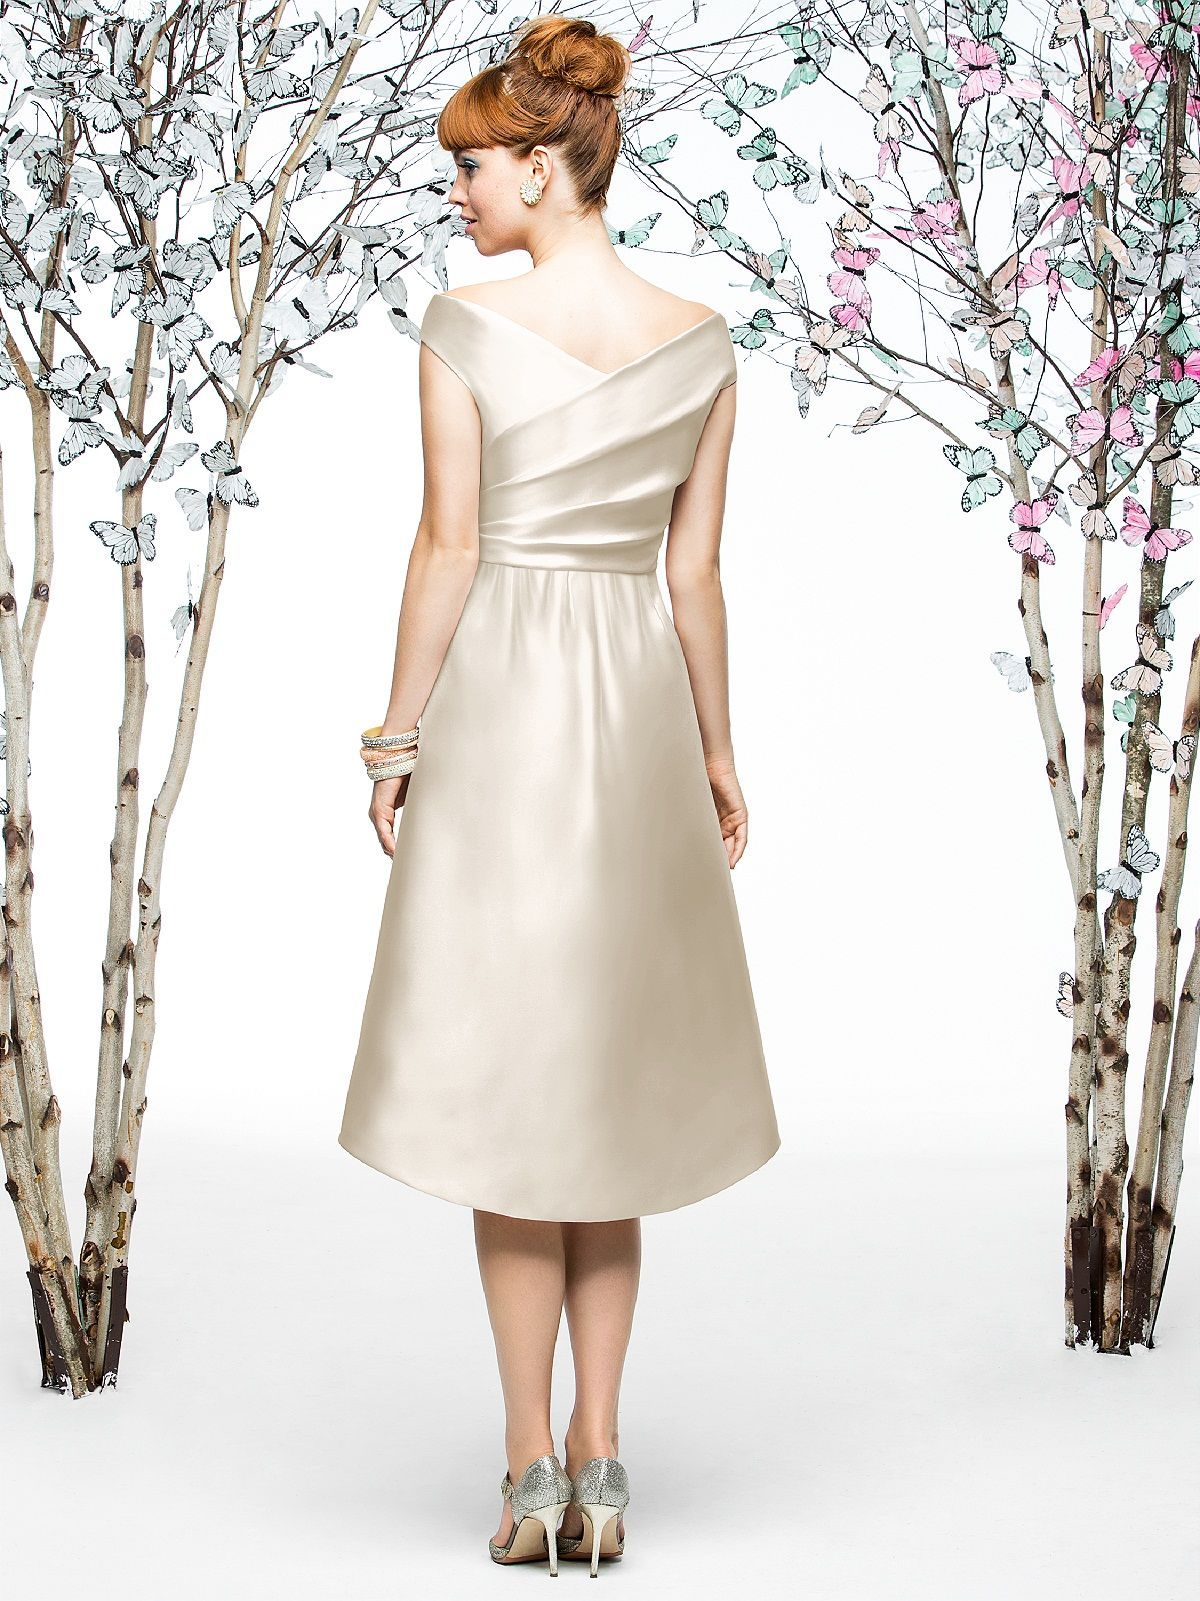 Lela Rose Style LR197 http://www.dessy.com/dresses/bridesmaid/lr197 ...